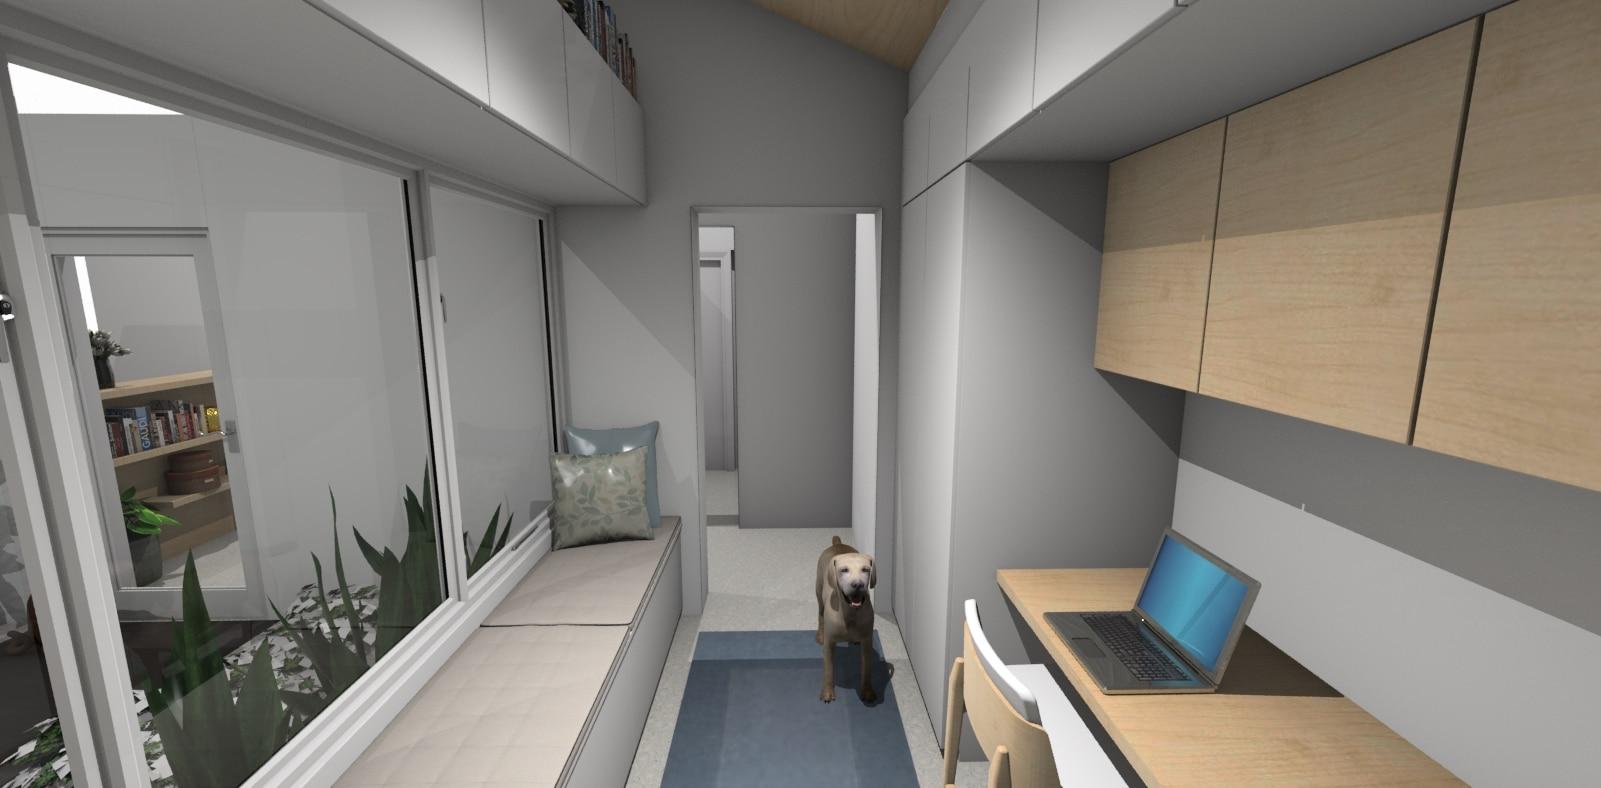 Home office 3D render in a long slim space 1